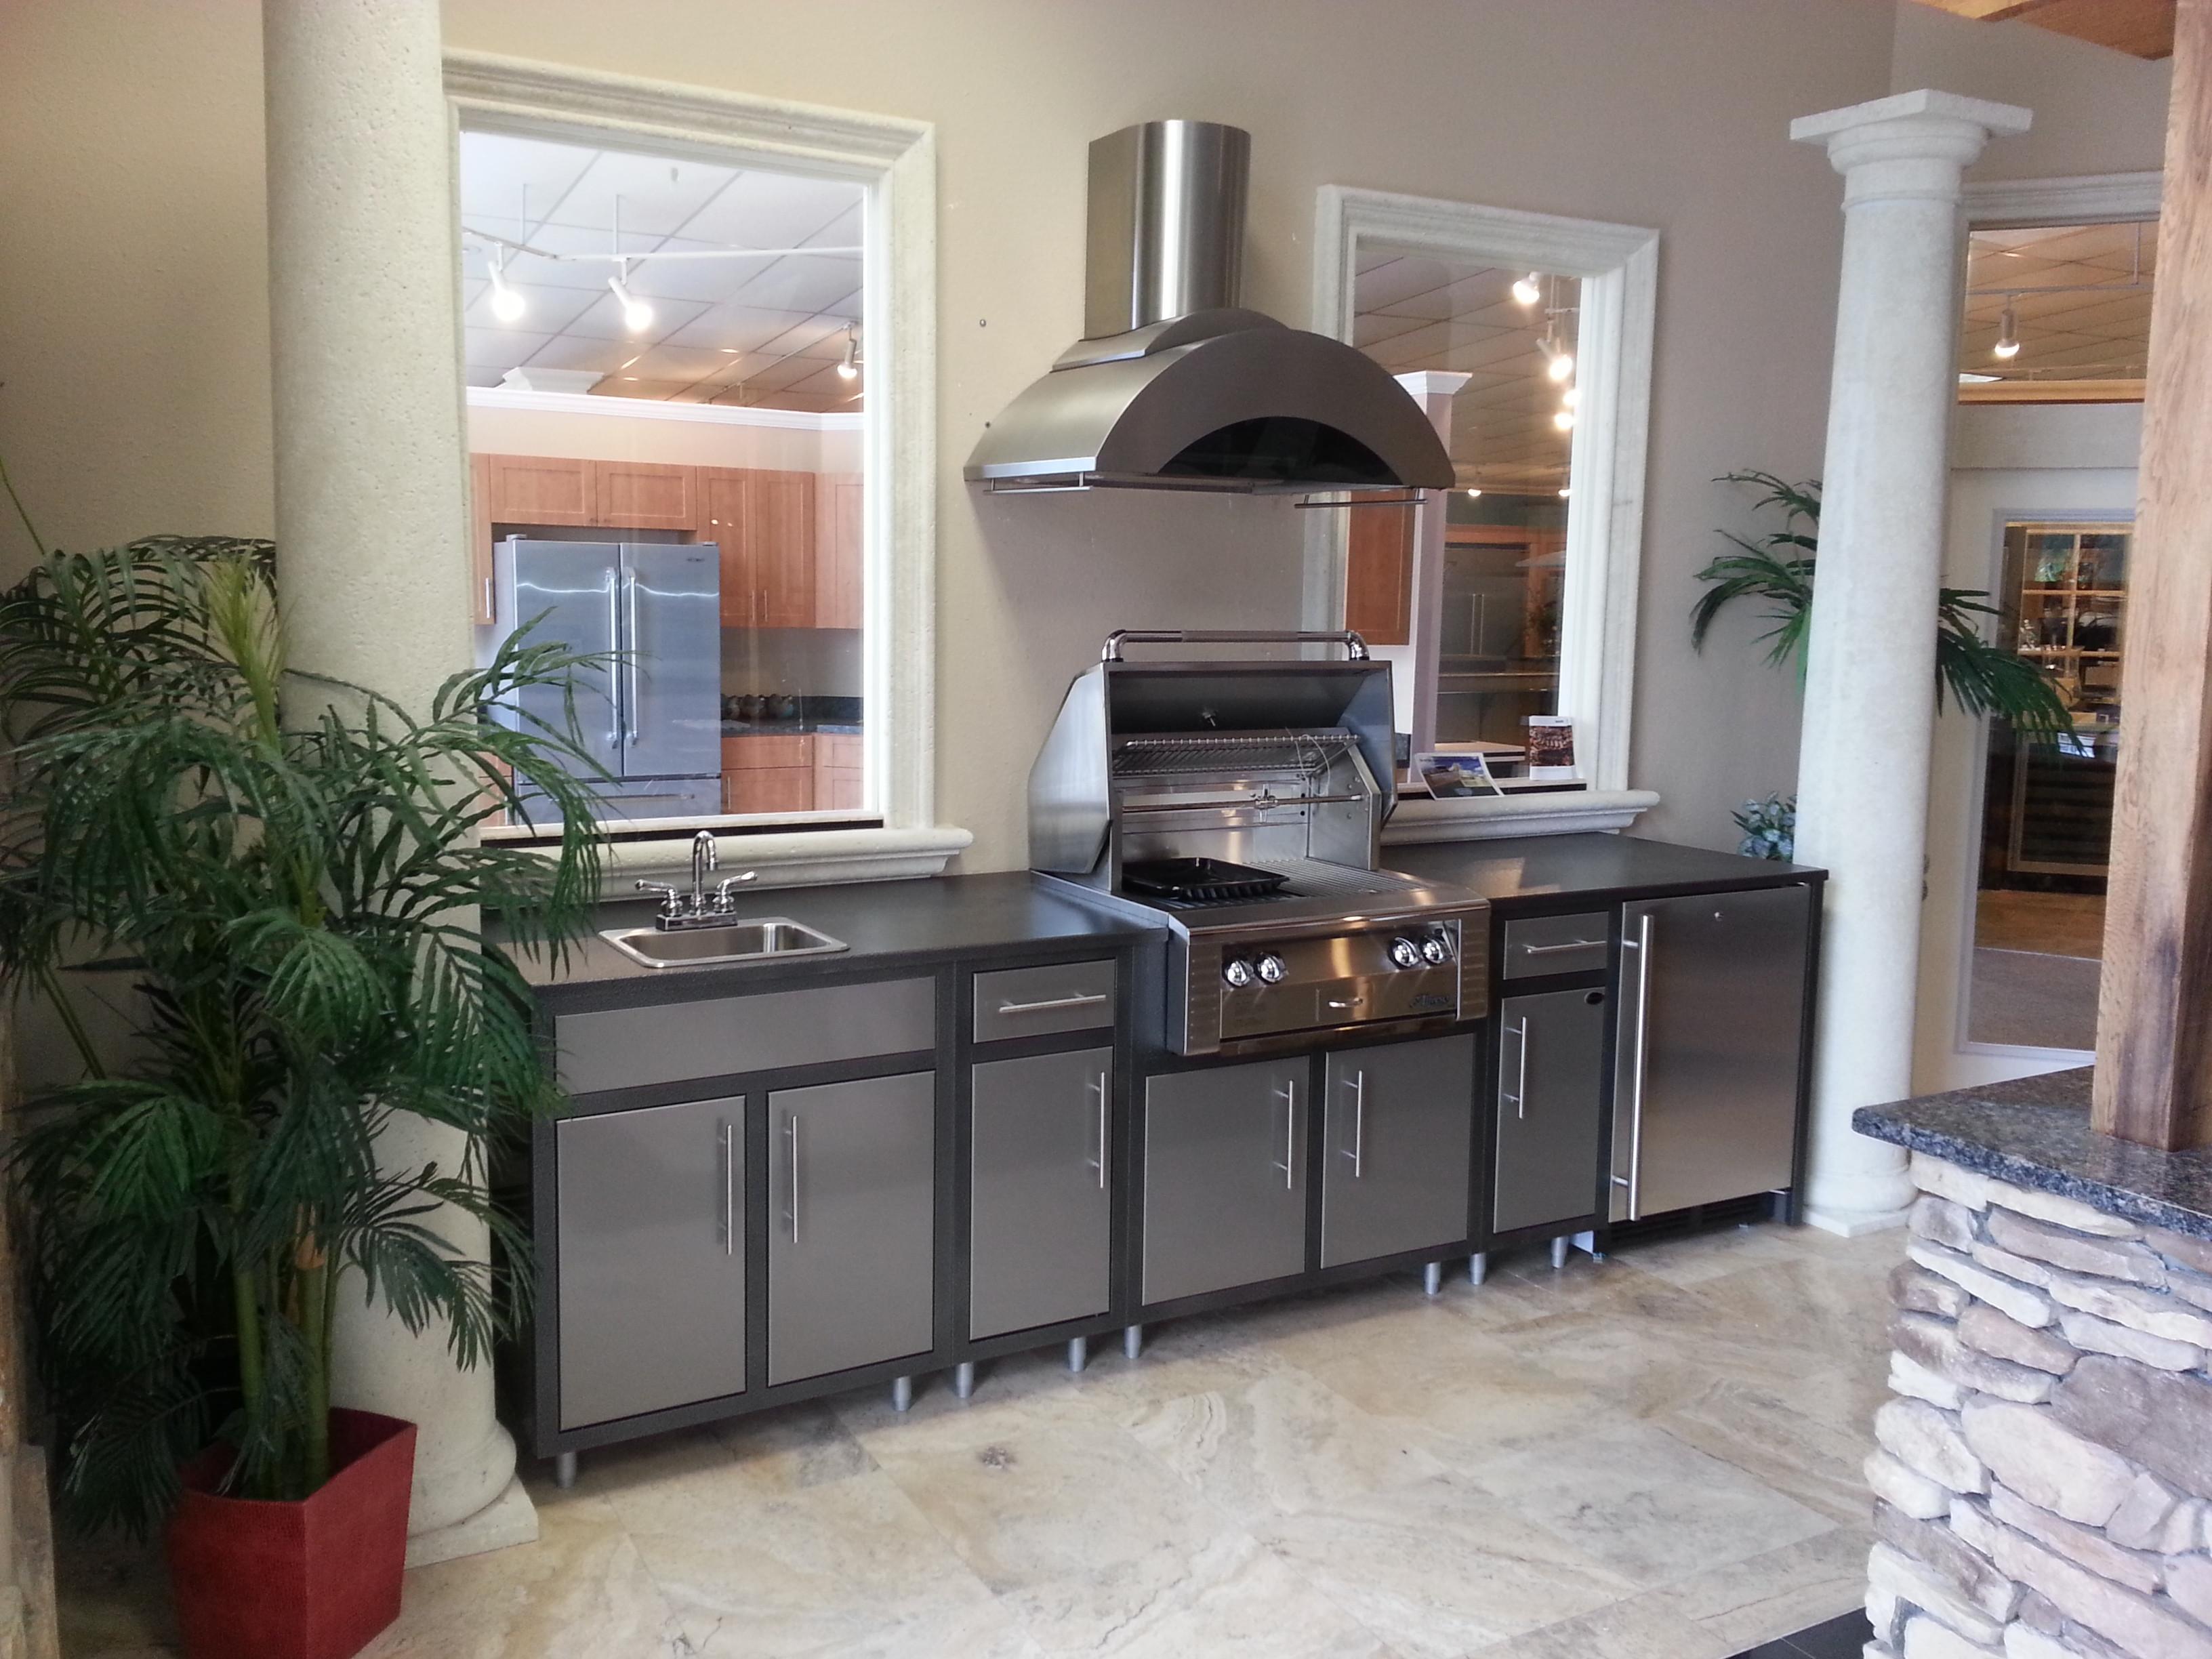 challenger designs modular outdoor kitchen - ajax pool & spa inc.